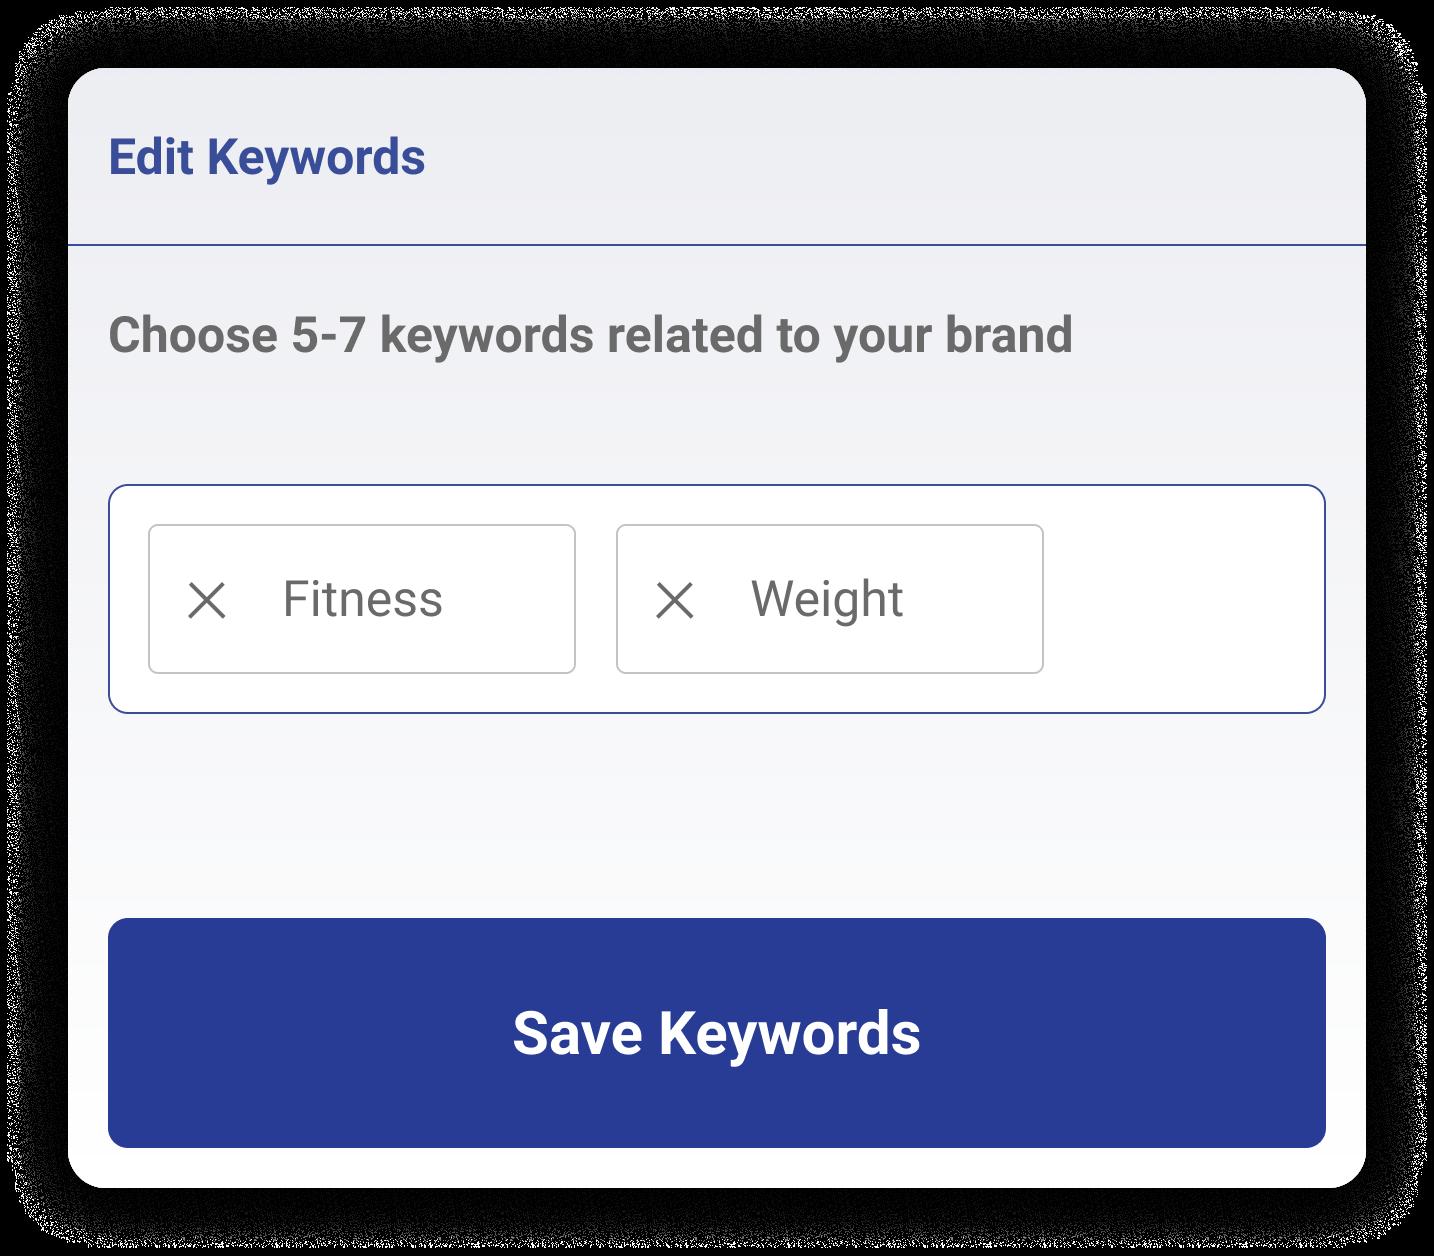 Stylized view of Magellan AI platform displaying keyword search